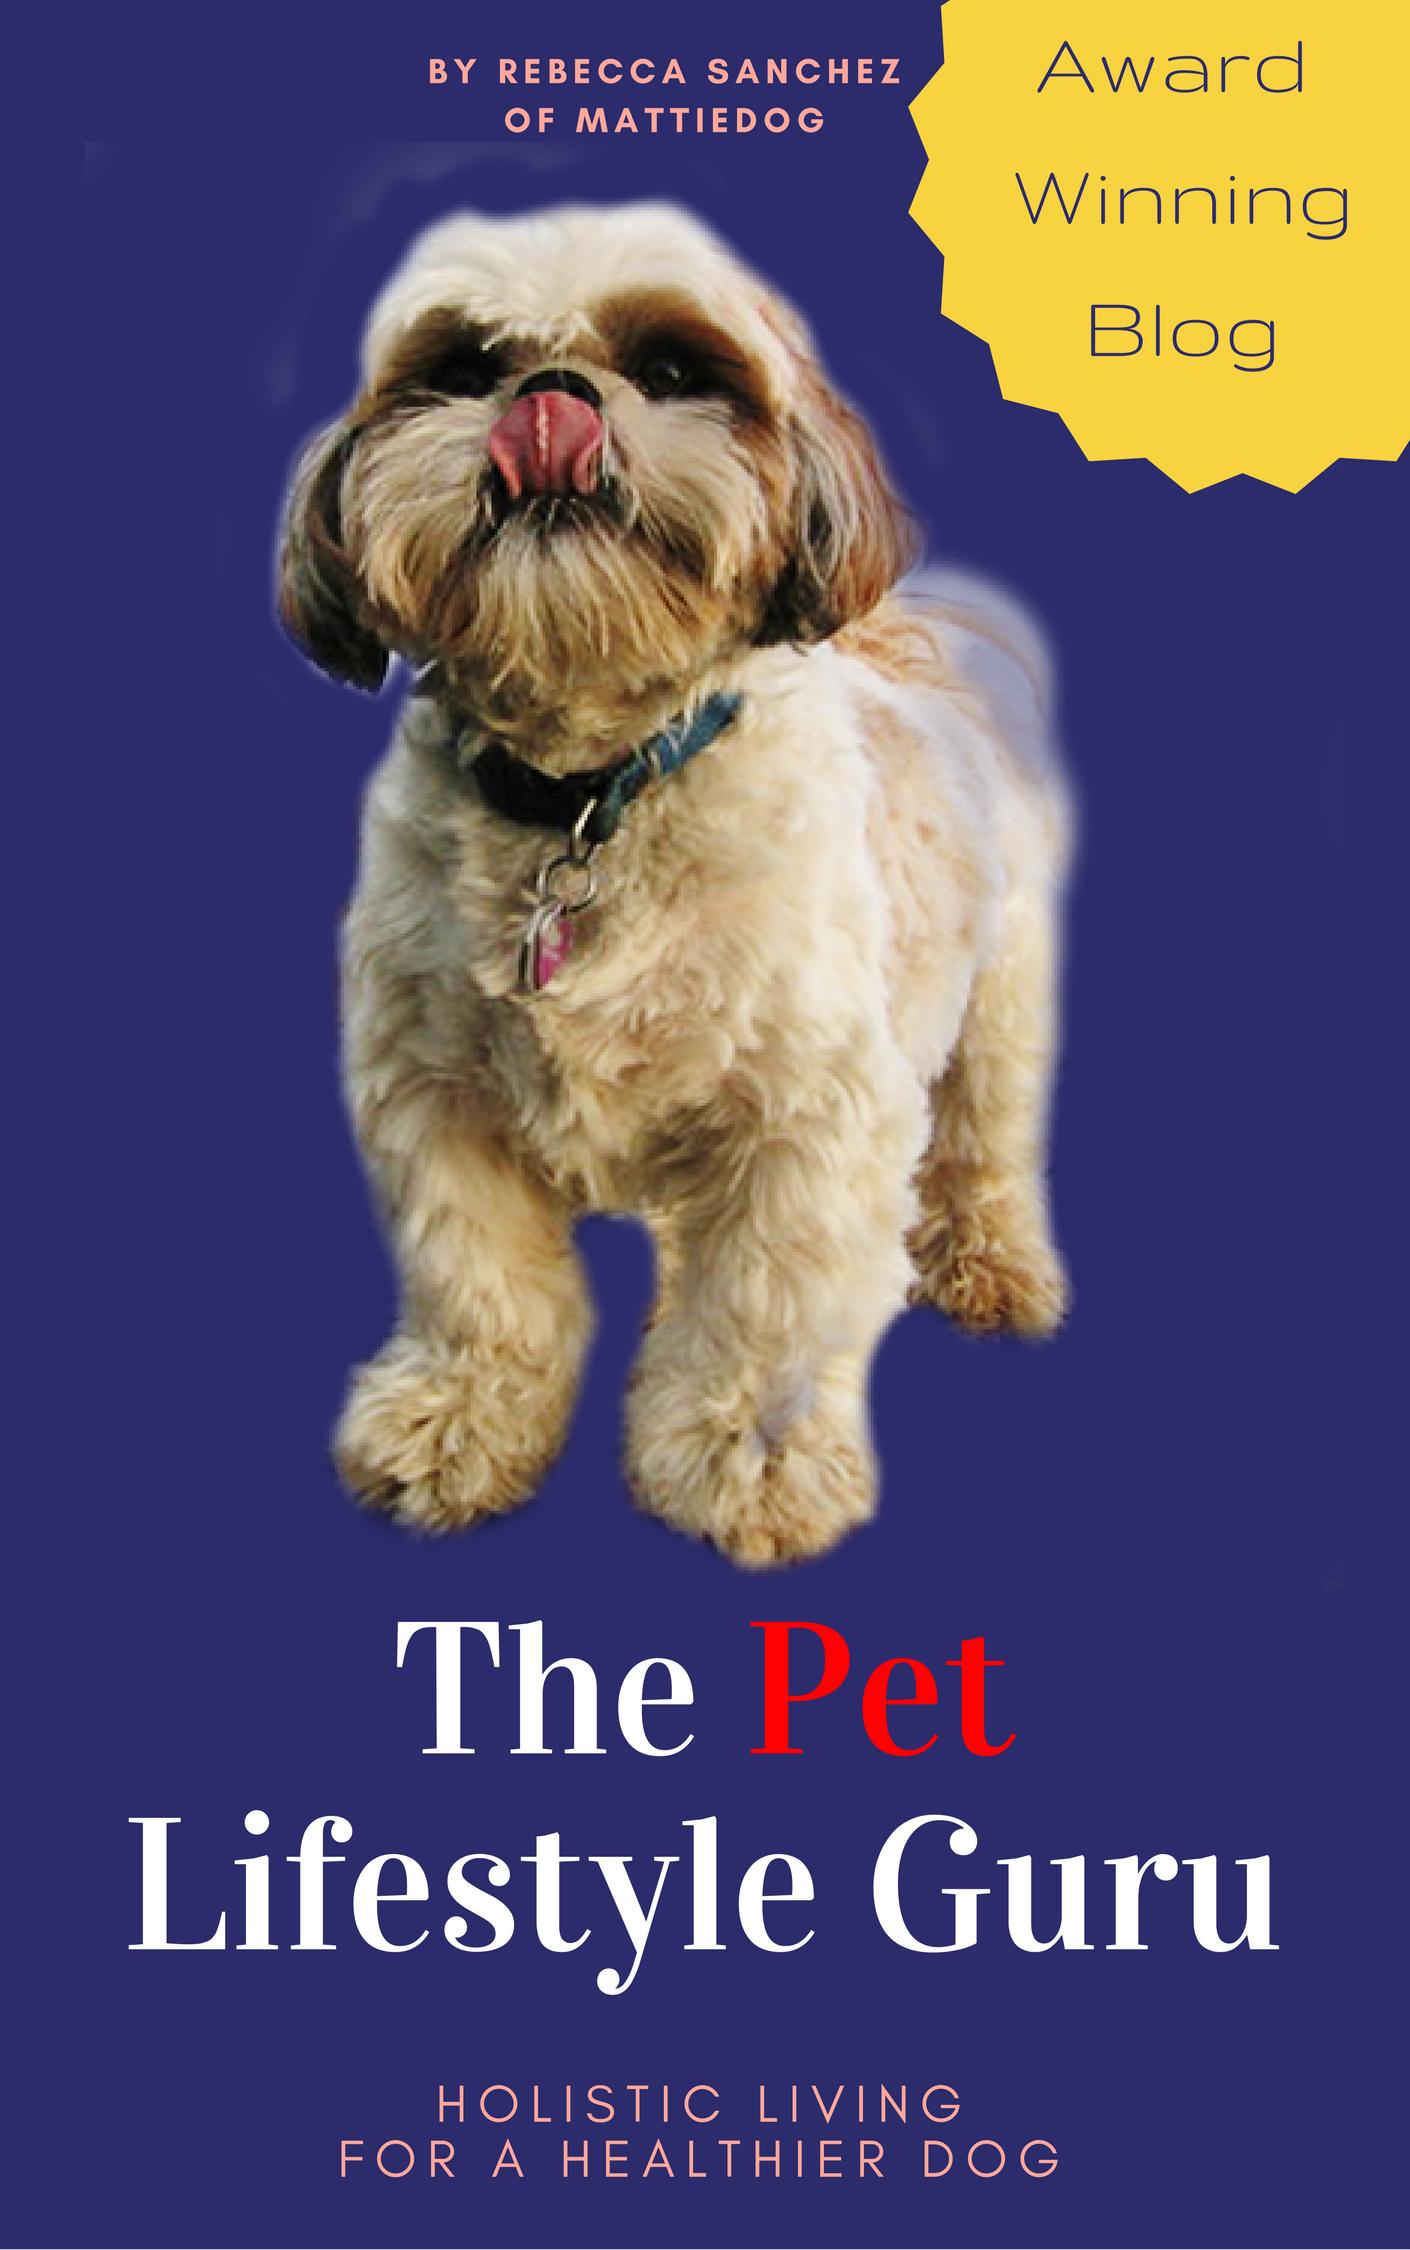 Mattiedog S Blog Animal Rescue Fundraising Writing Author Holistic Dog Healthy Holistic Living Healthy Dogs